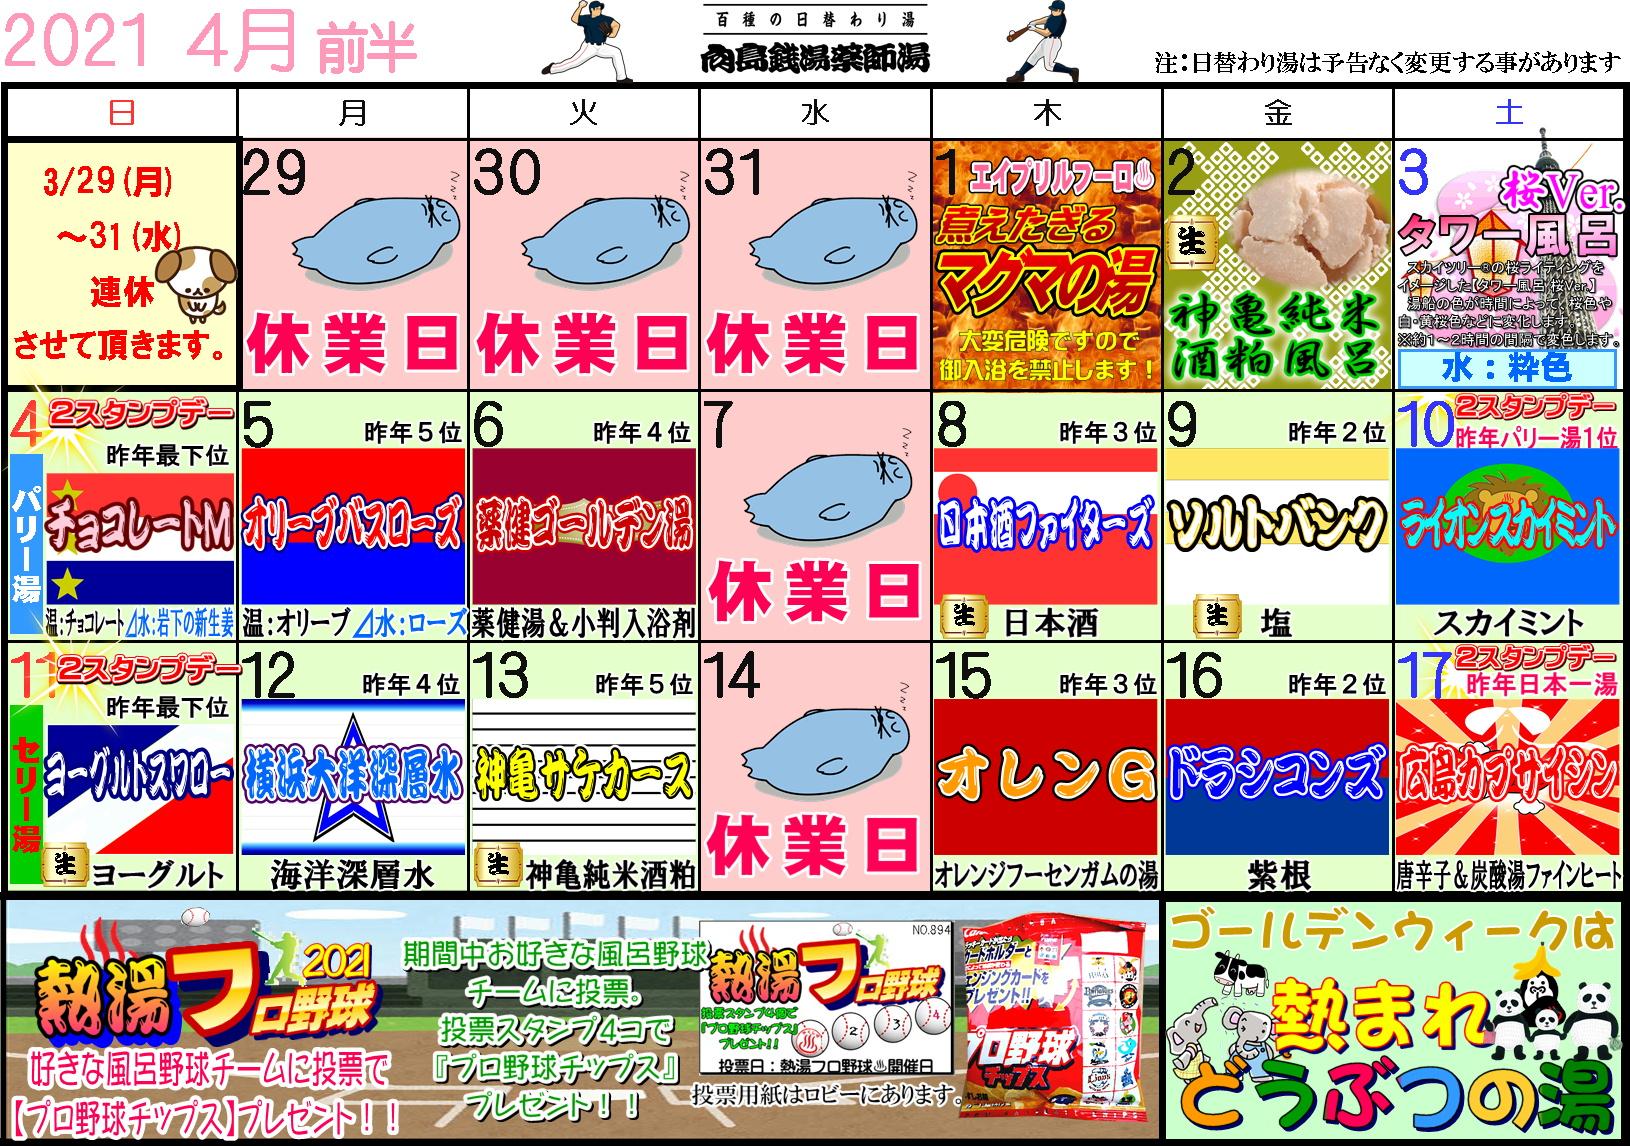 【日替り薬湯】4月前半